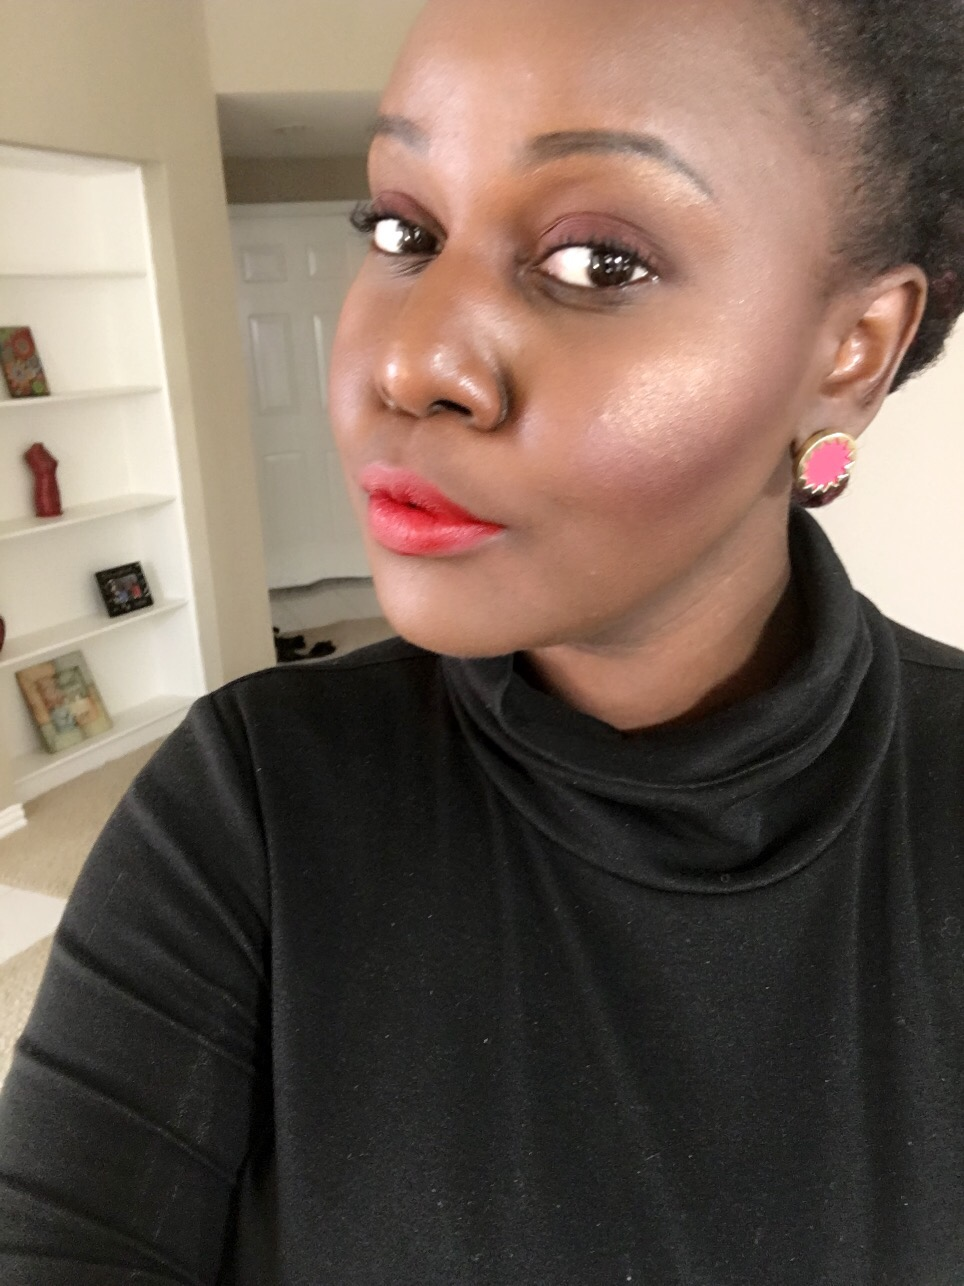 outlaw brick red Kat Von D Everlasting Liquid Lipsticks Review on Dark Skin Black Women of color